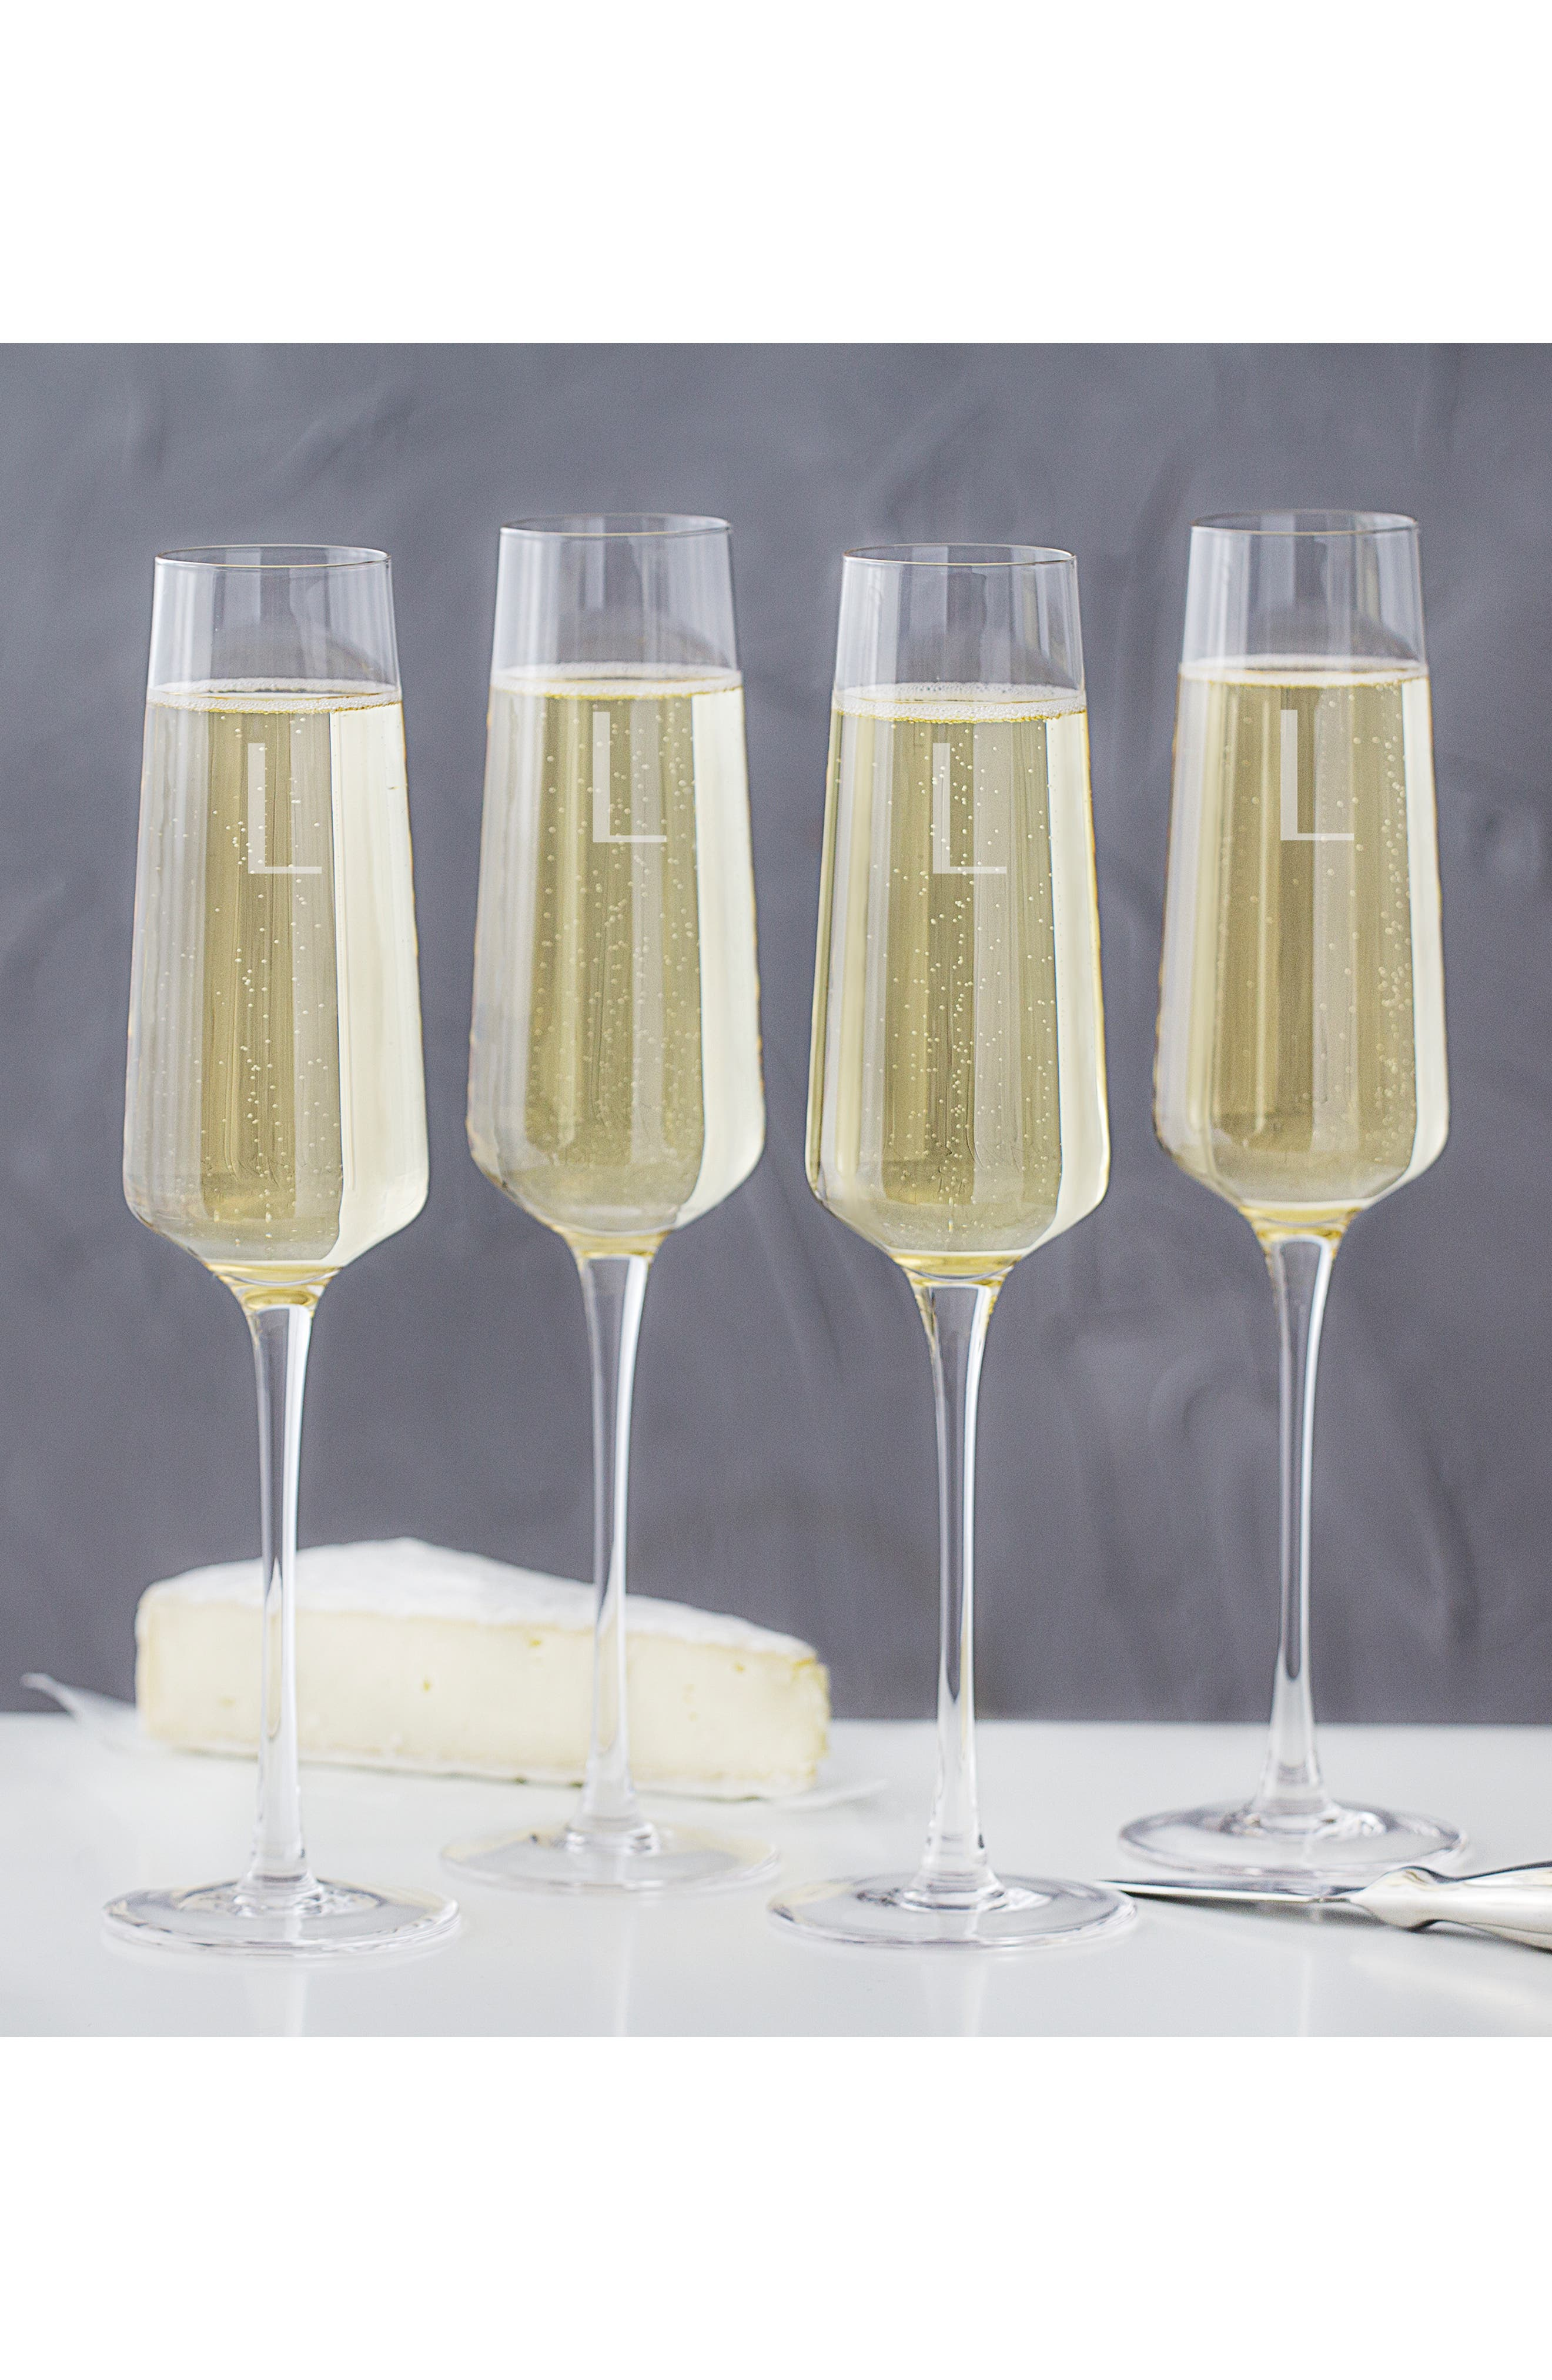 CATHY'S CONCEPTS, Estate Collection Set of 4 Monogram Champagne Flutes, Alternate thumbnail 3, color, A